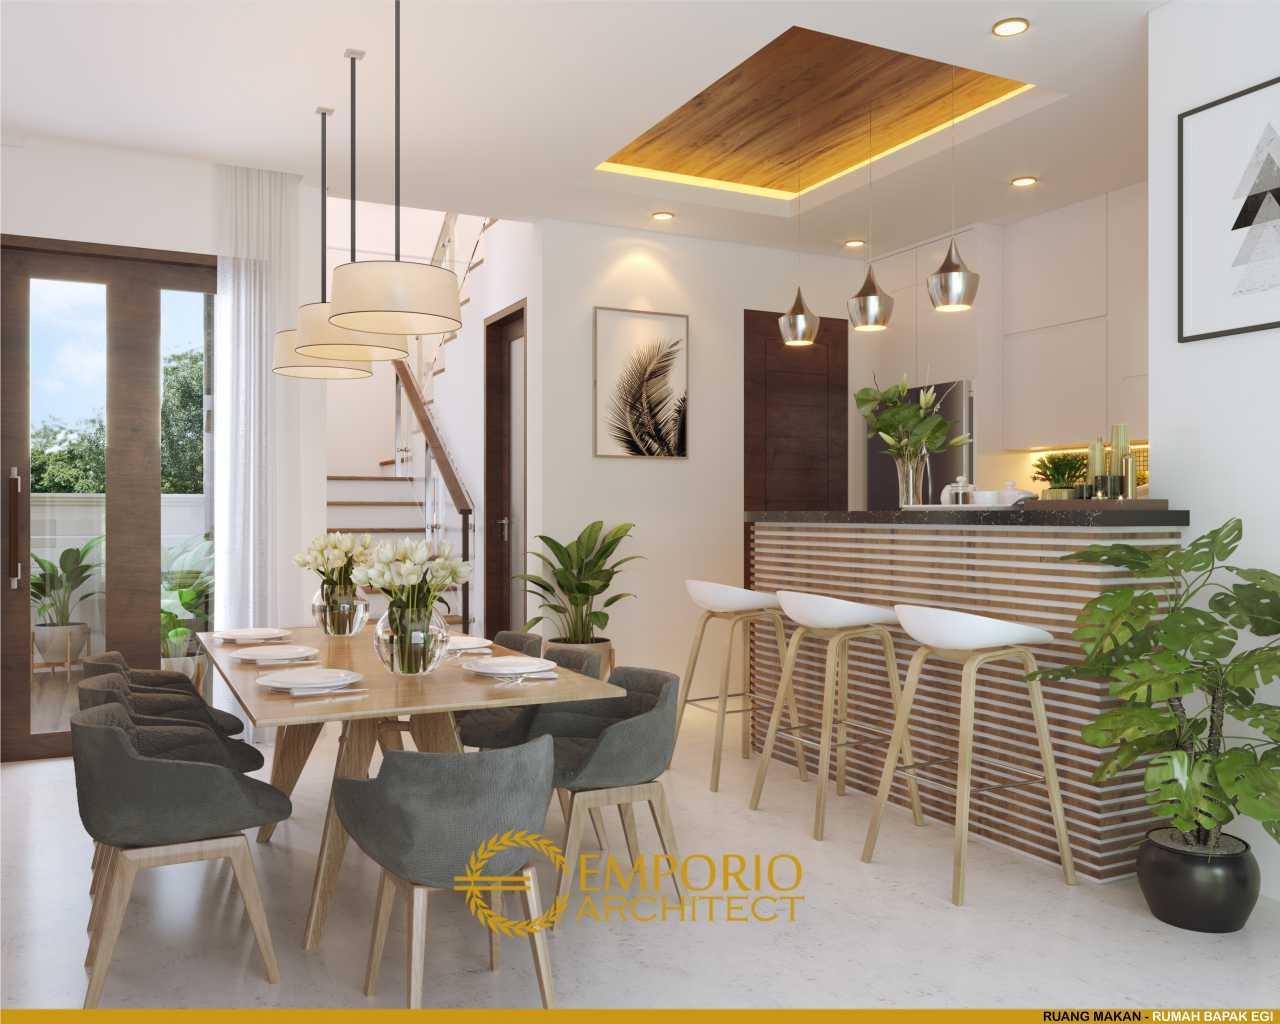 Emporio Architect Jasa Arsitek Denpasar Desain Rumah Modern 3 Lantai 734 @ Denpasar, Bali Kota Denpasar, Bali, Indonesia Kota Denpasar, Bali, Indonesia Emporio-Architect-Jasa-Arsitek-Denpasar-Desain-Rumah-Modern-3-Lantai-734-Denpasar-Bali  93967